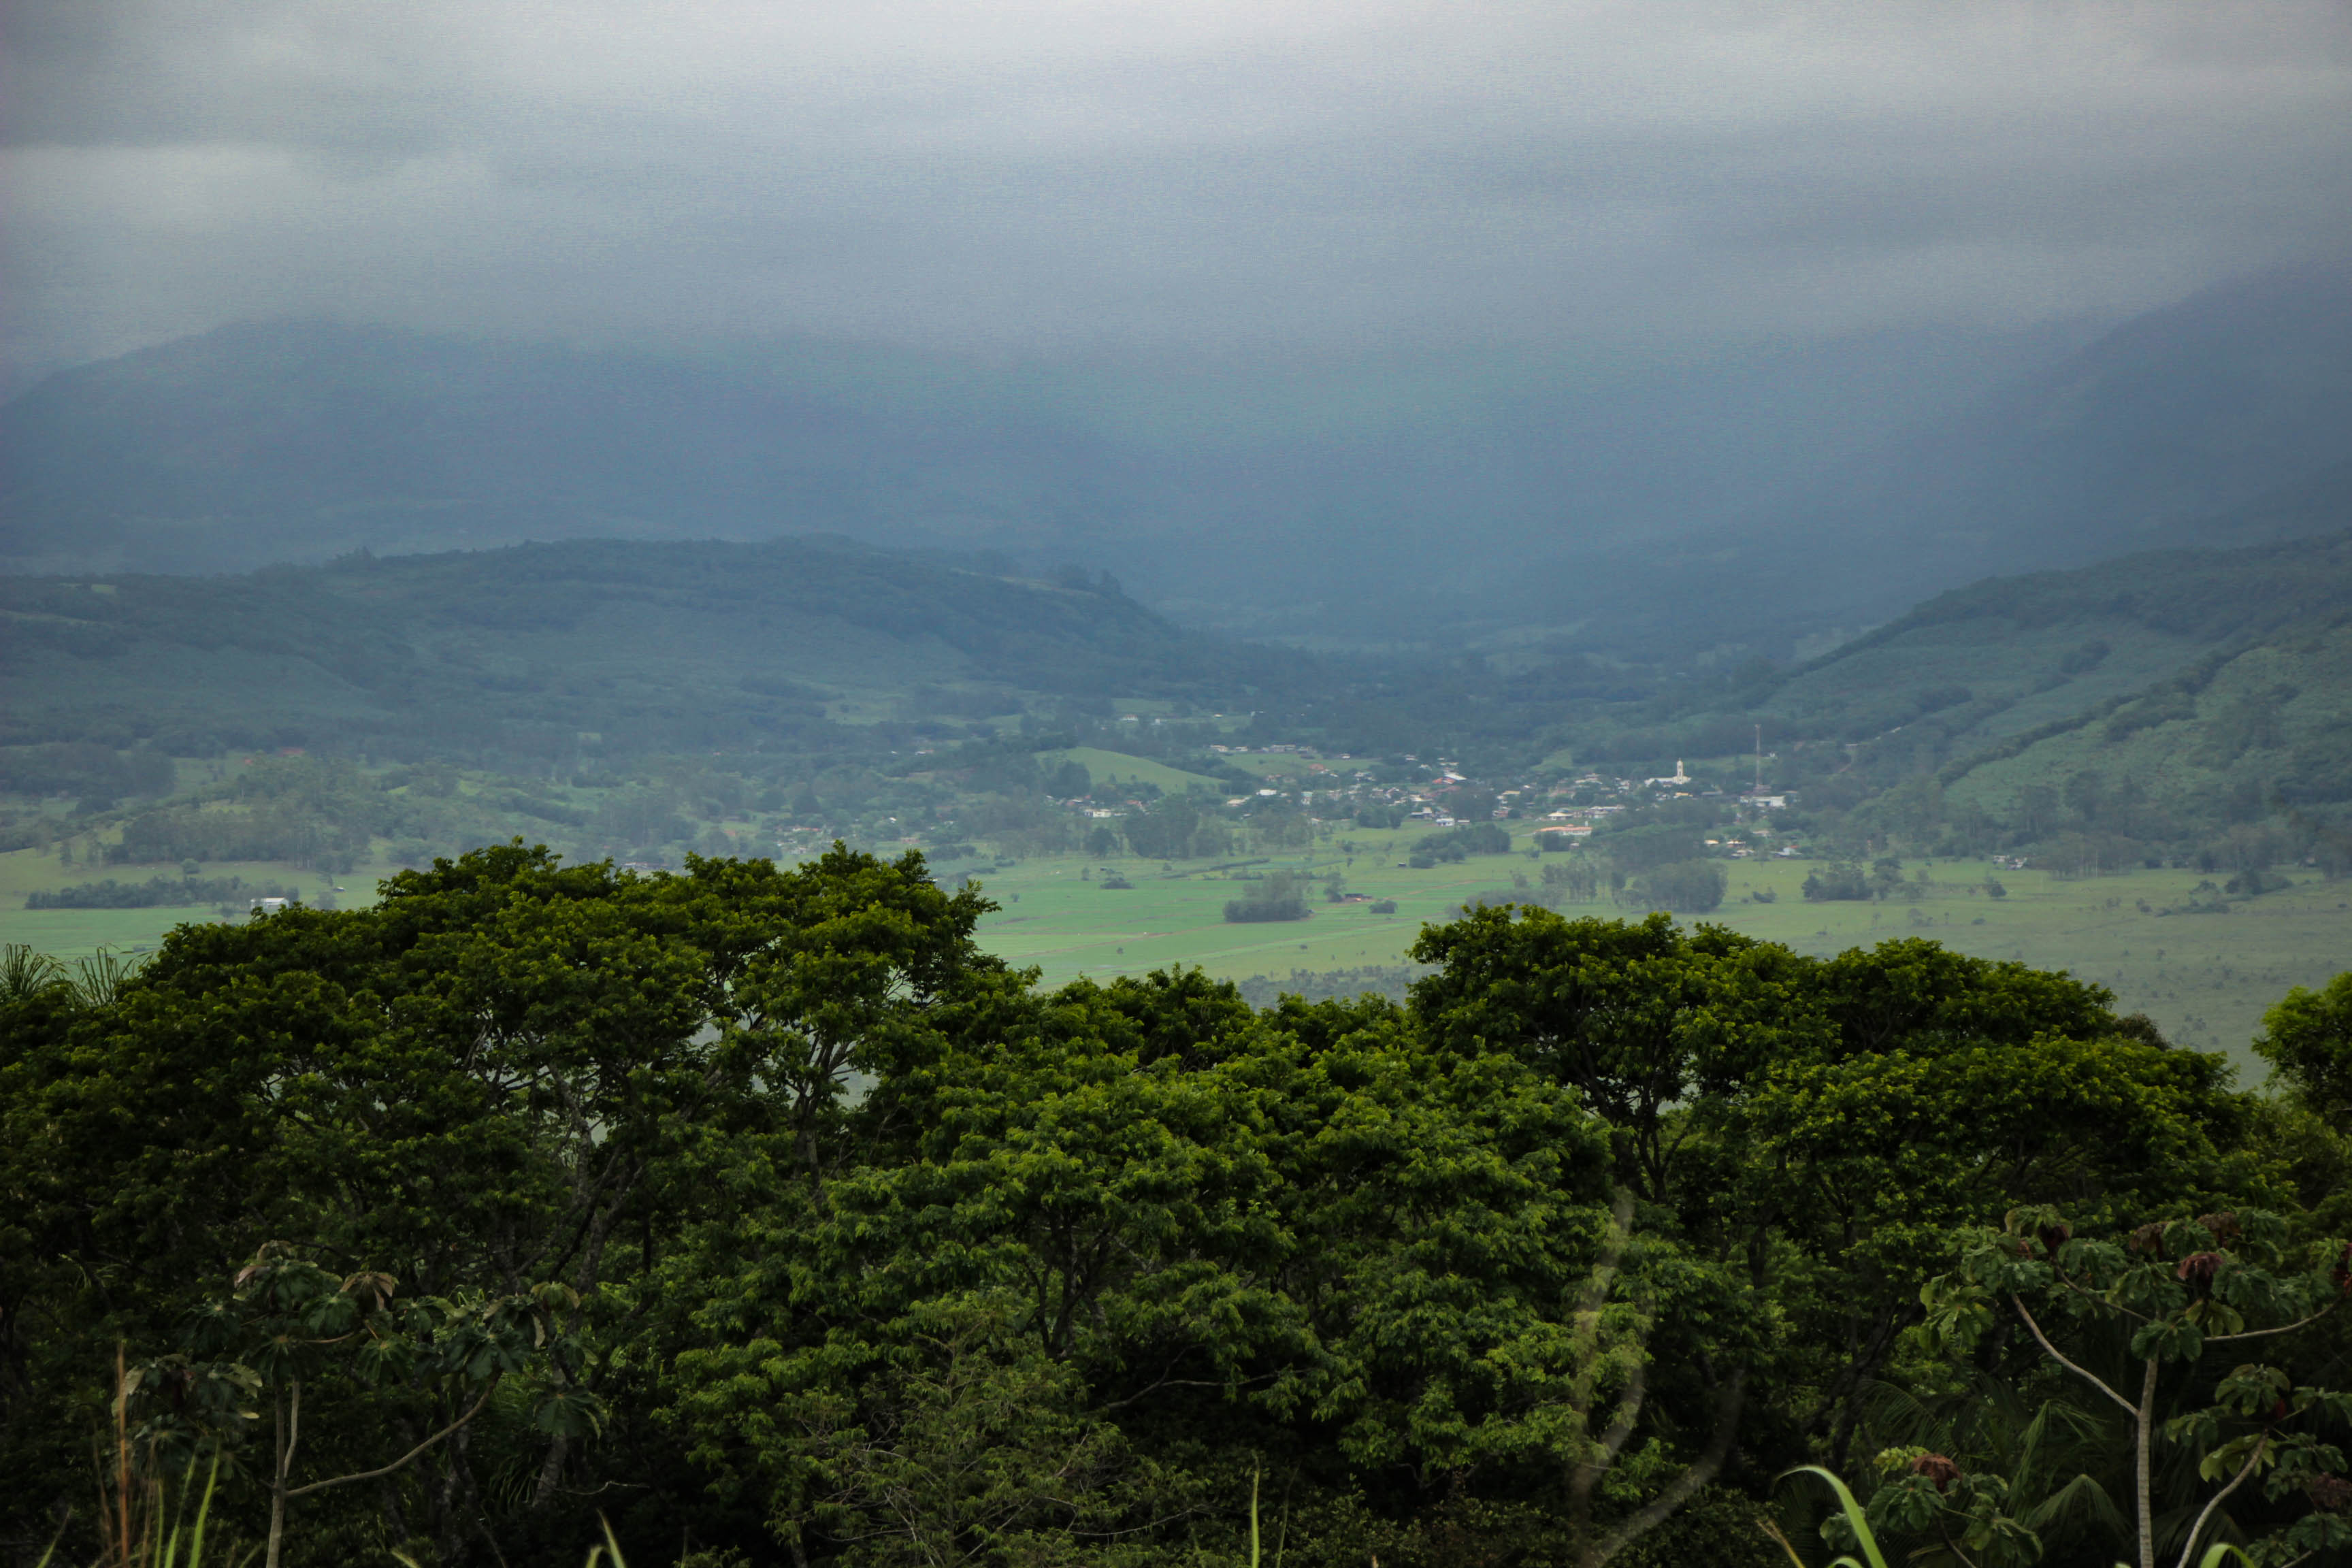 DOM PEDRO DE ALCÂNTARA Morro da Boa Vista